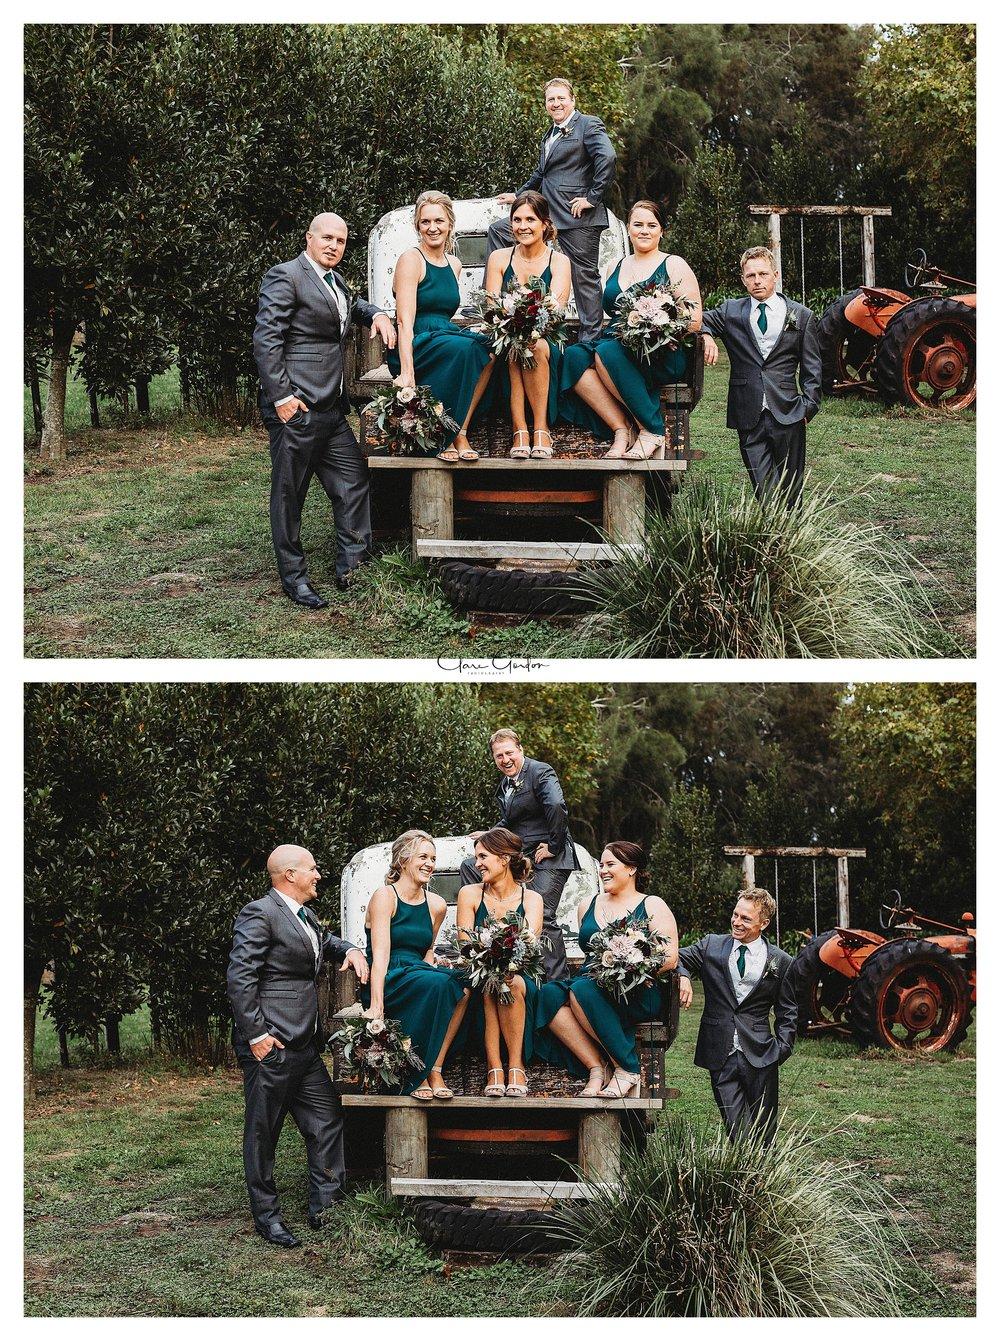 Eagle-ridge-wedding-photo-bridal-party